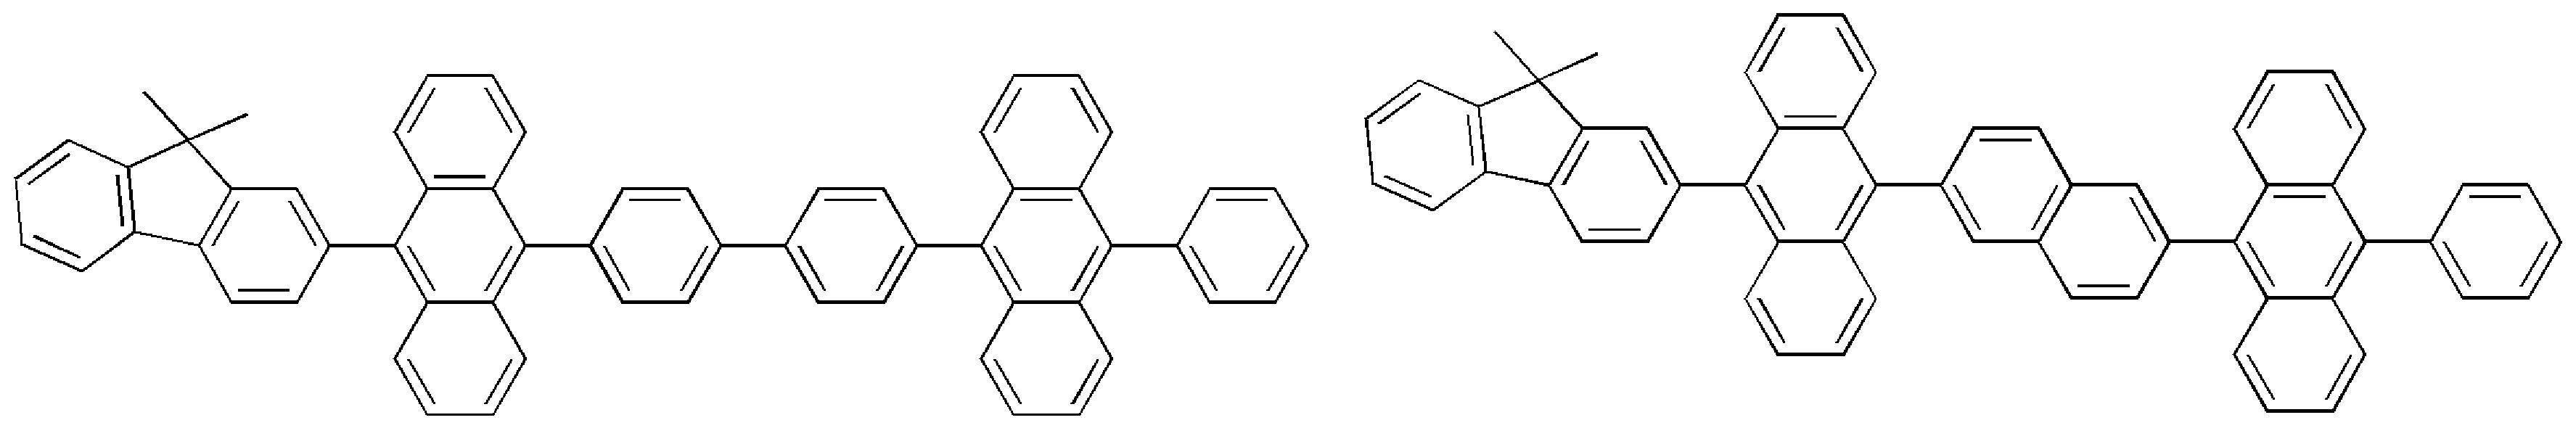 Figure 112007083008831-pat00584